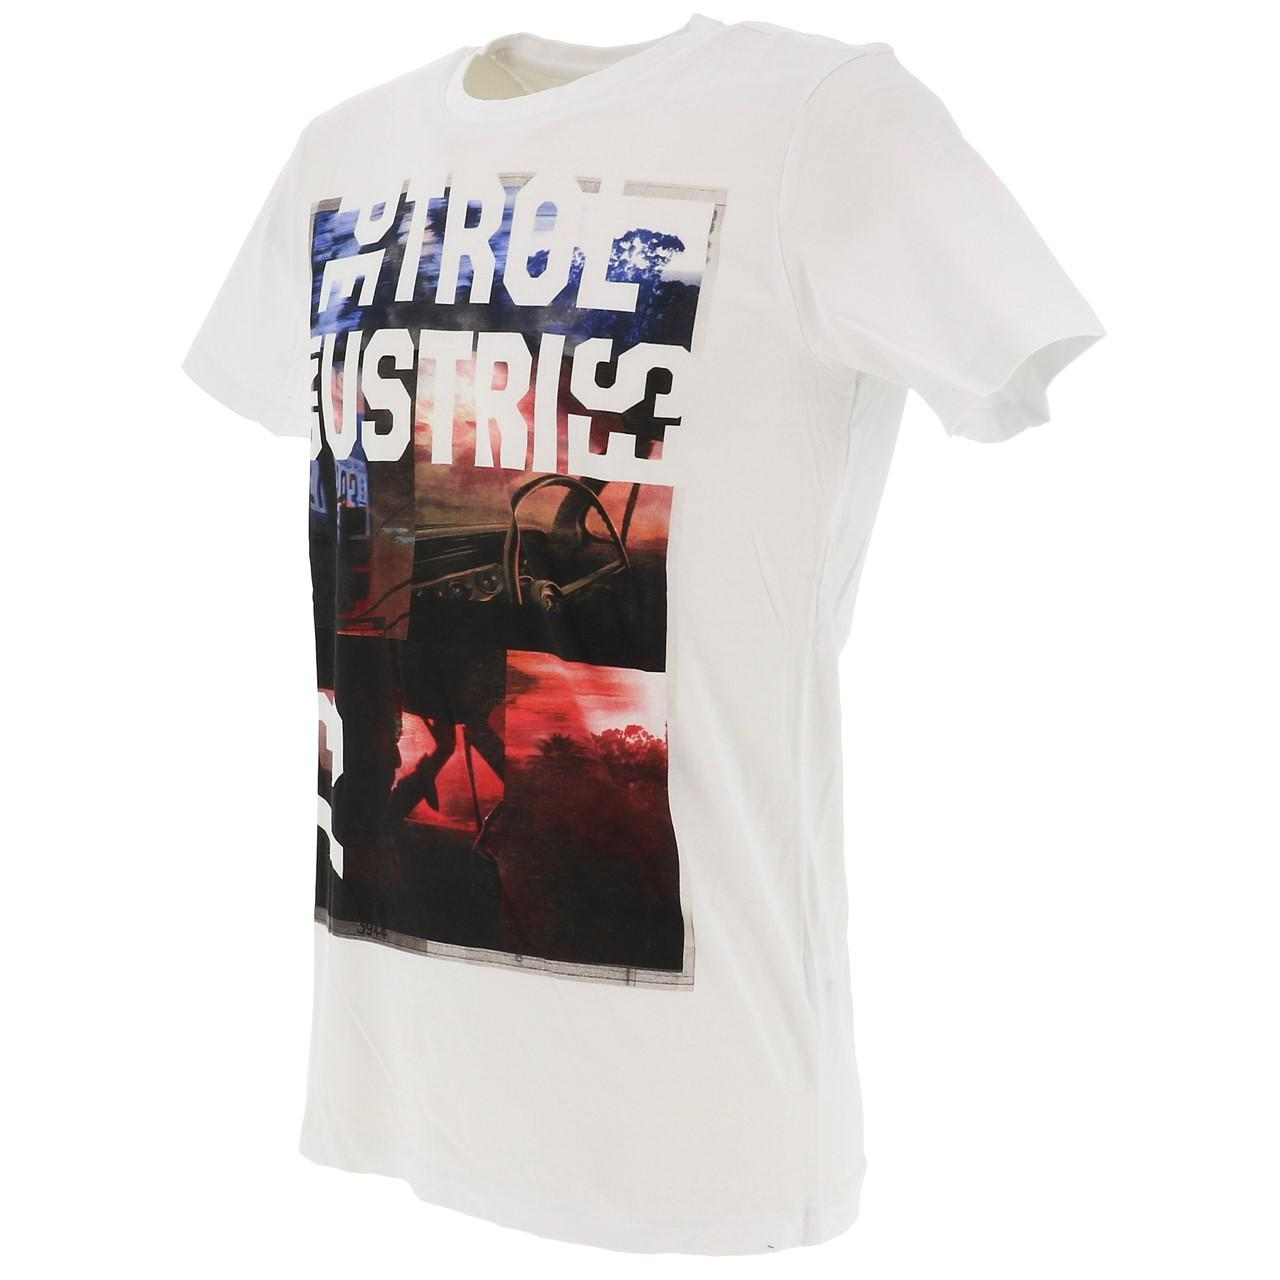 Short-Sleeve-T-Shirt-Petrol-Industries-Tsr618-Bright-White-Tee-White-18081 thumbnail 4